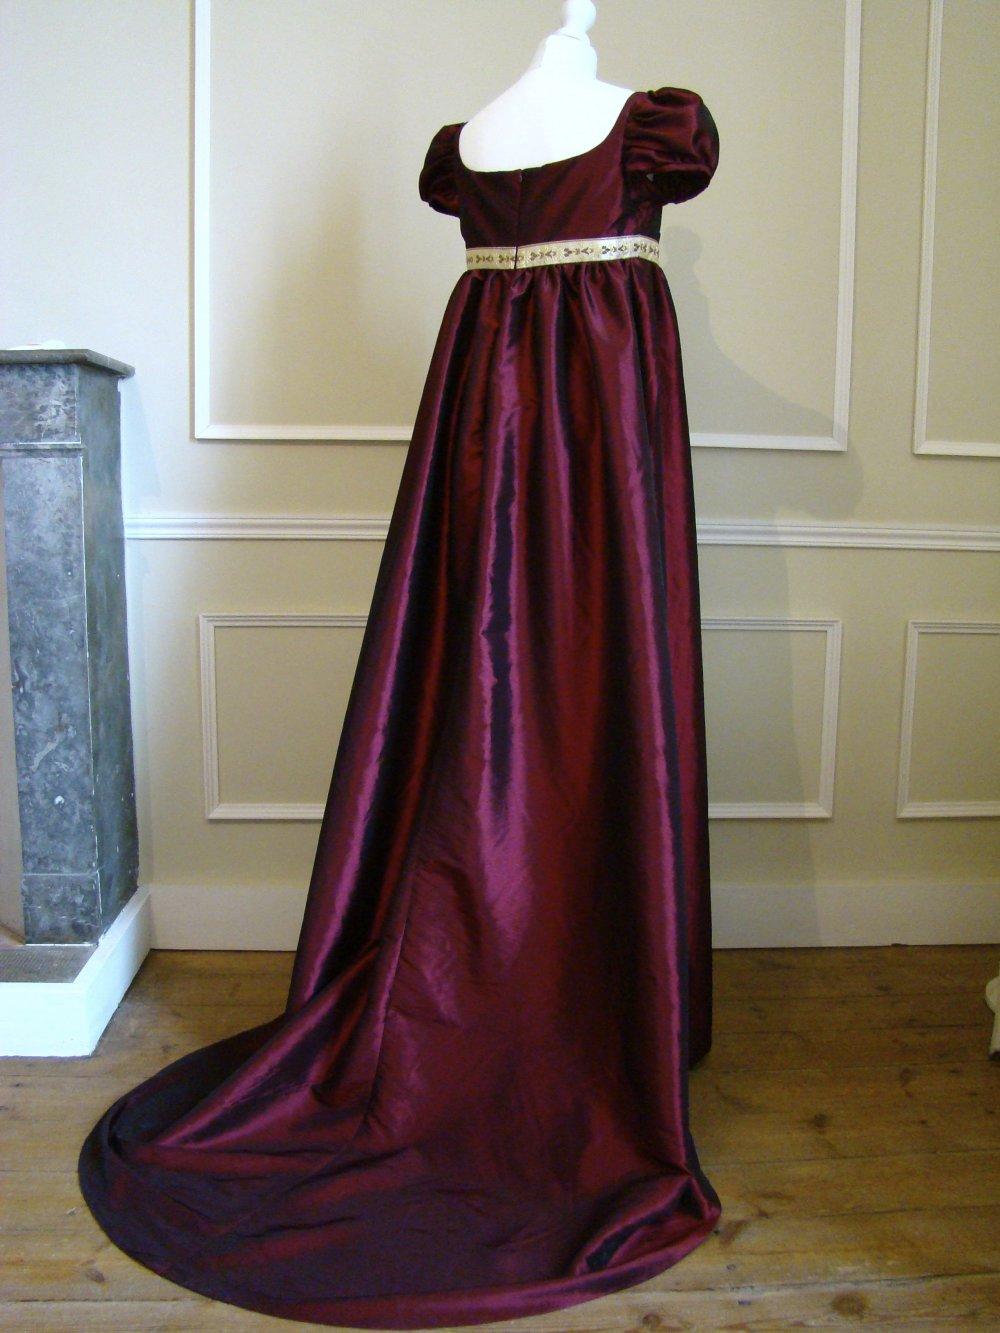 Robe Robe historique femme 1er Empire Joséphine en taffetas